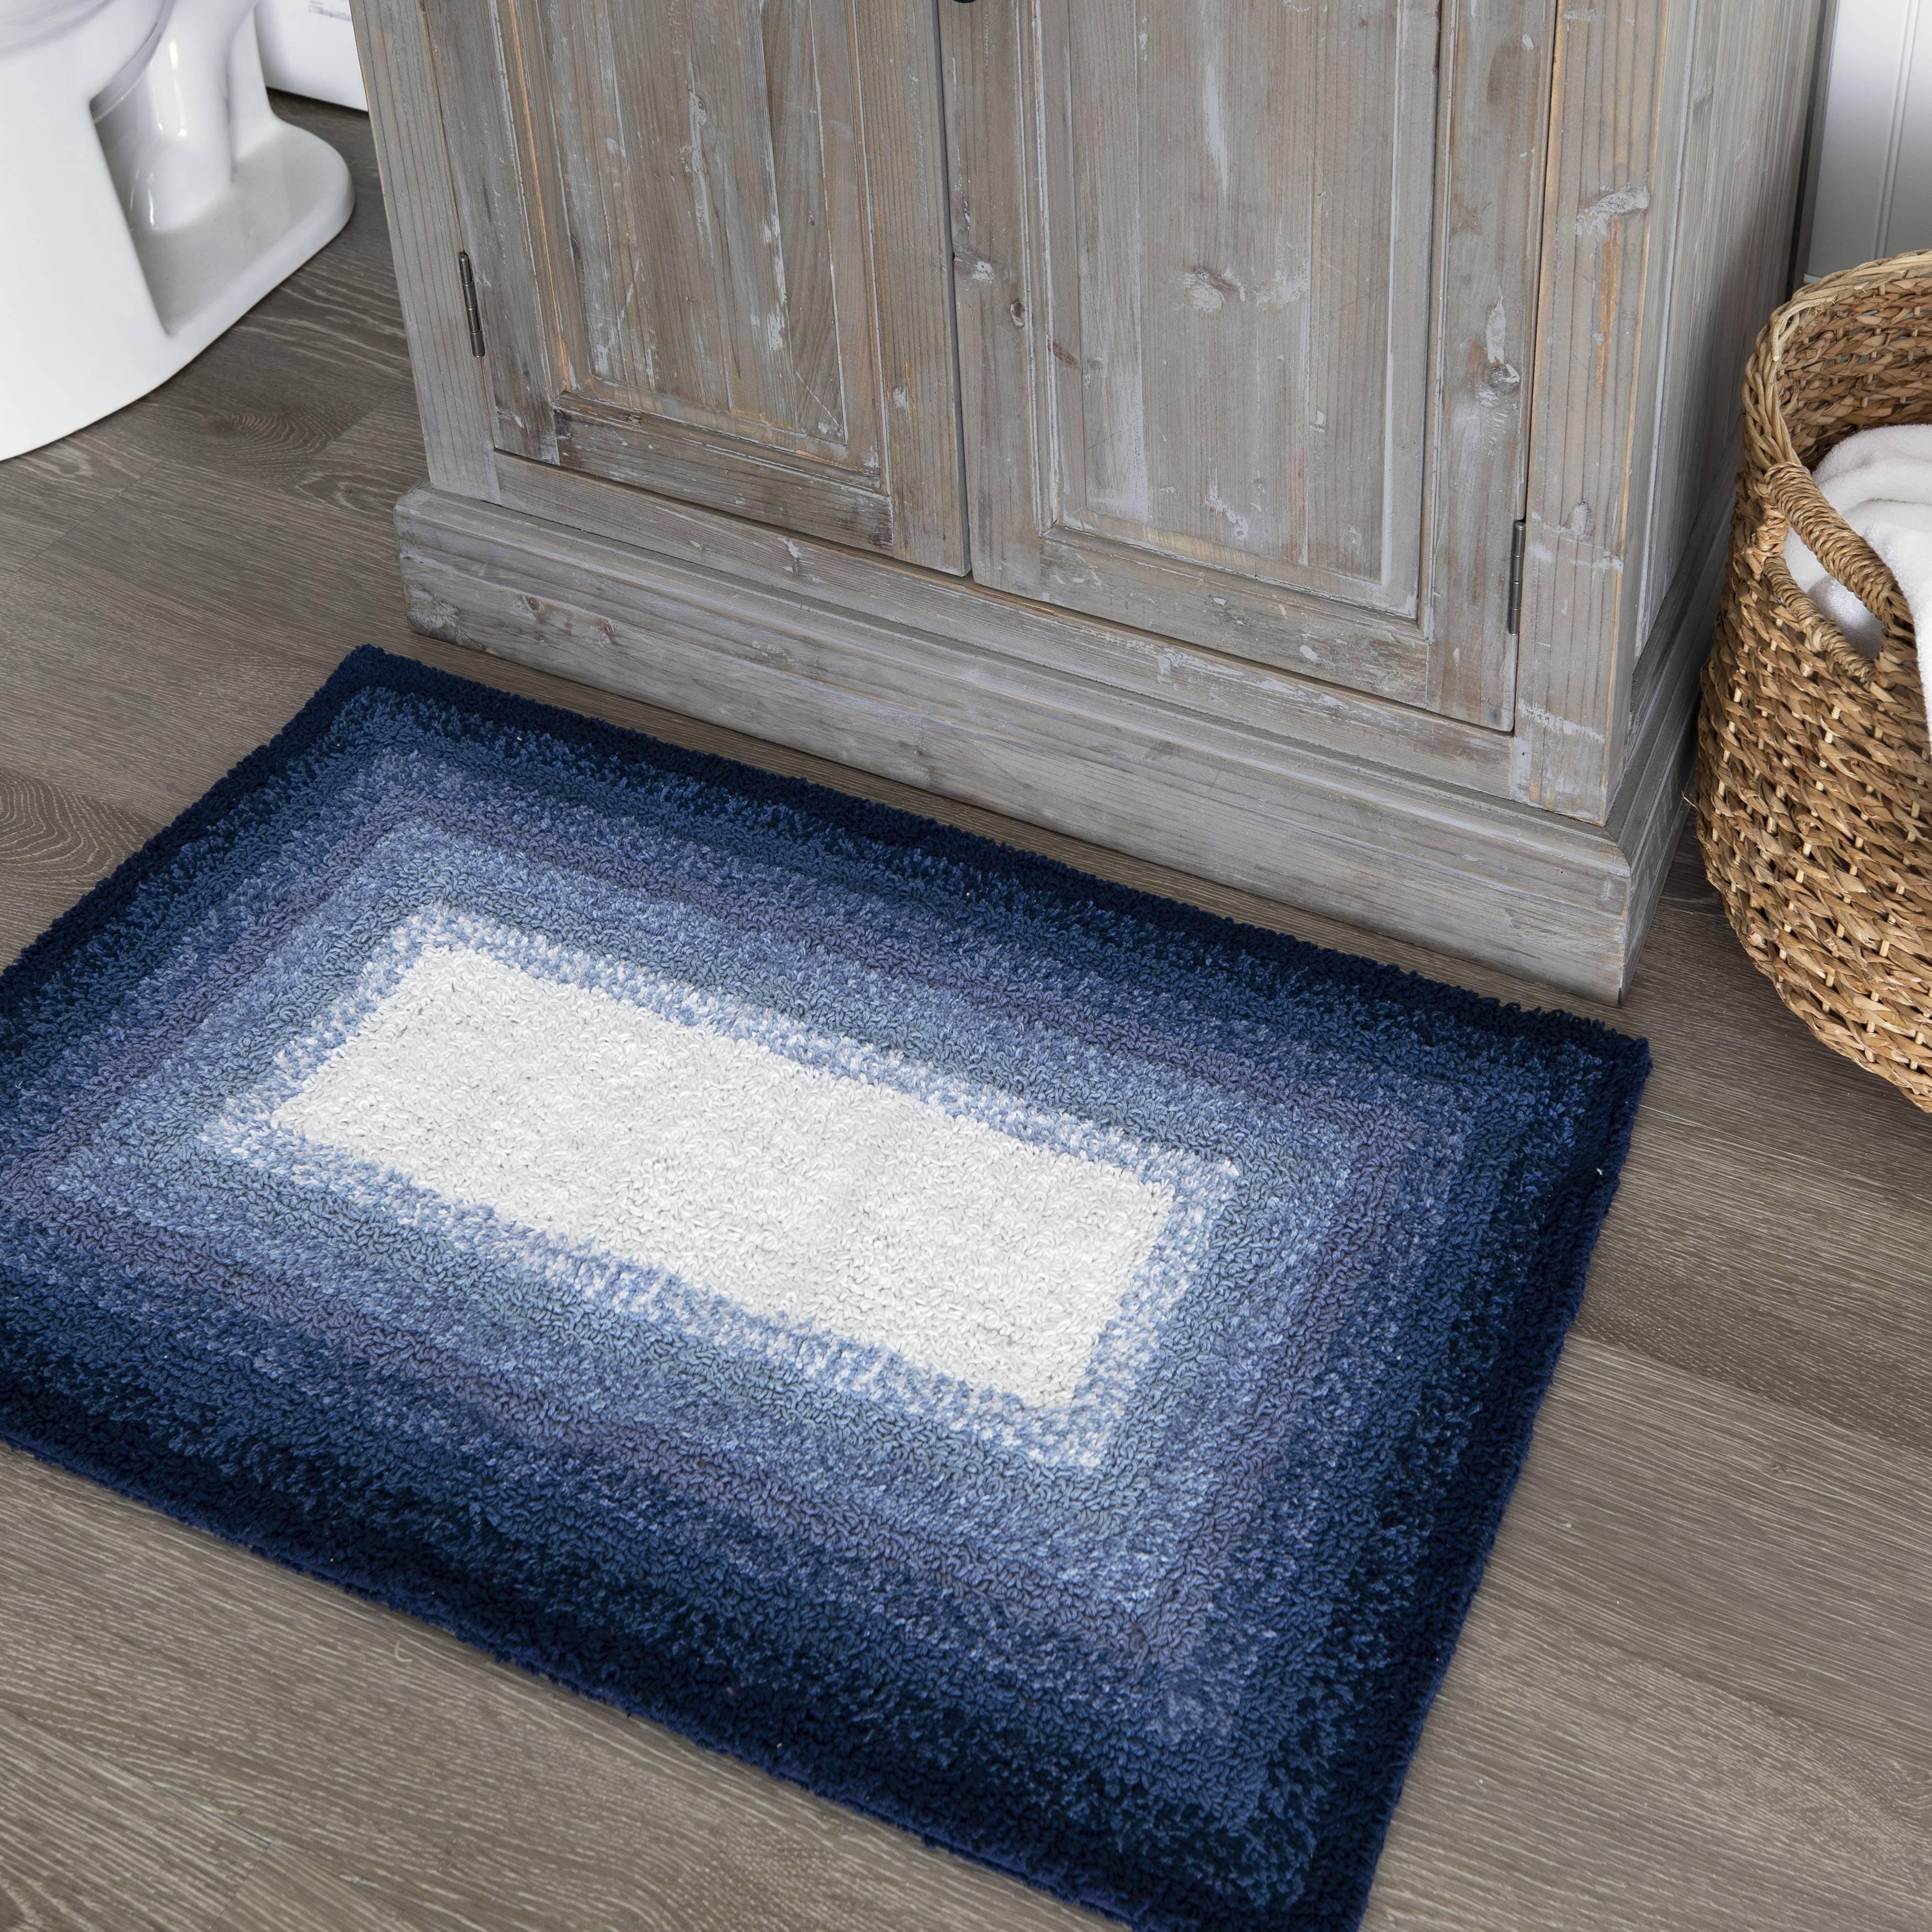 Better Homes Gardens Ombre Cotton Bath Rug Blue Admiral 20 X 30 Walmart Com Walmart Com